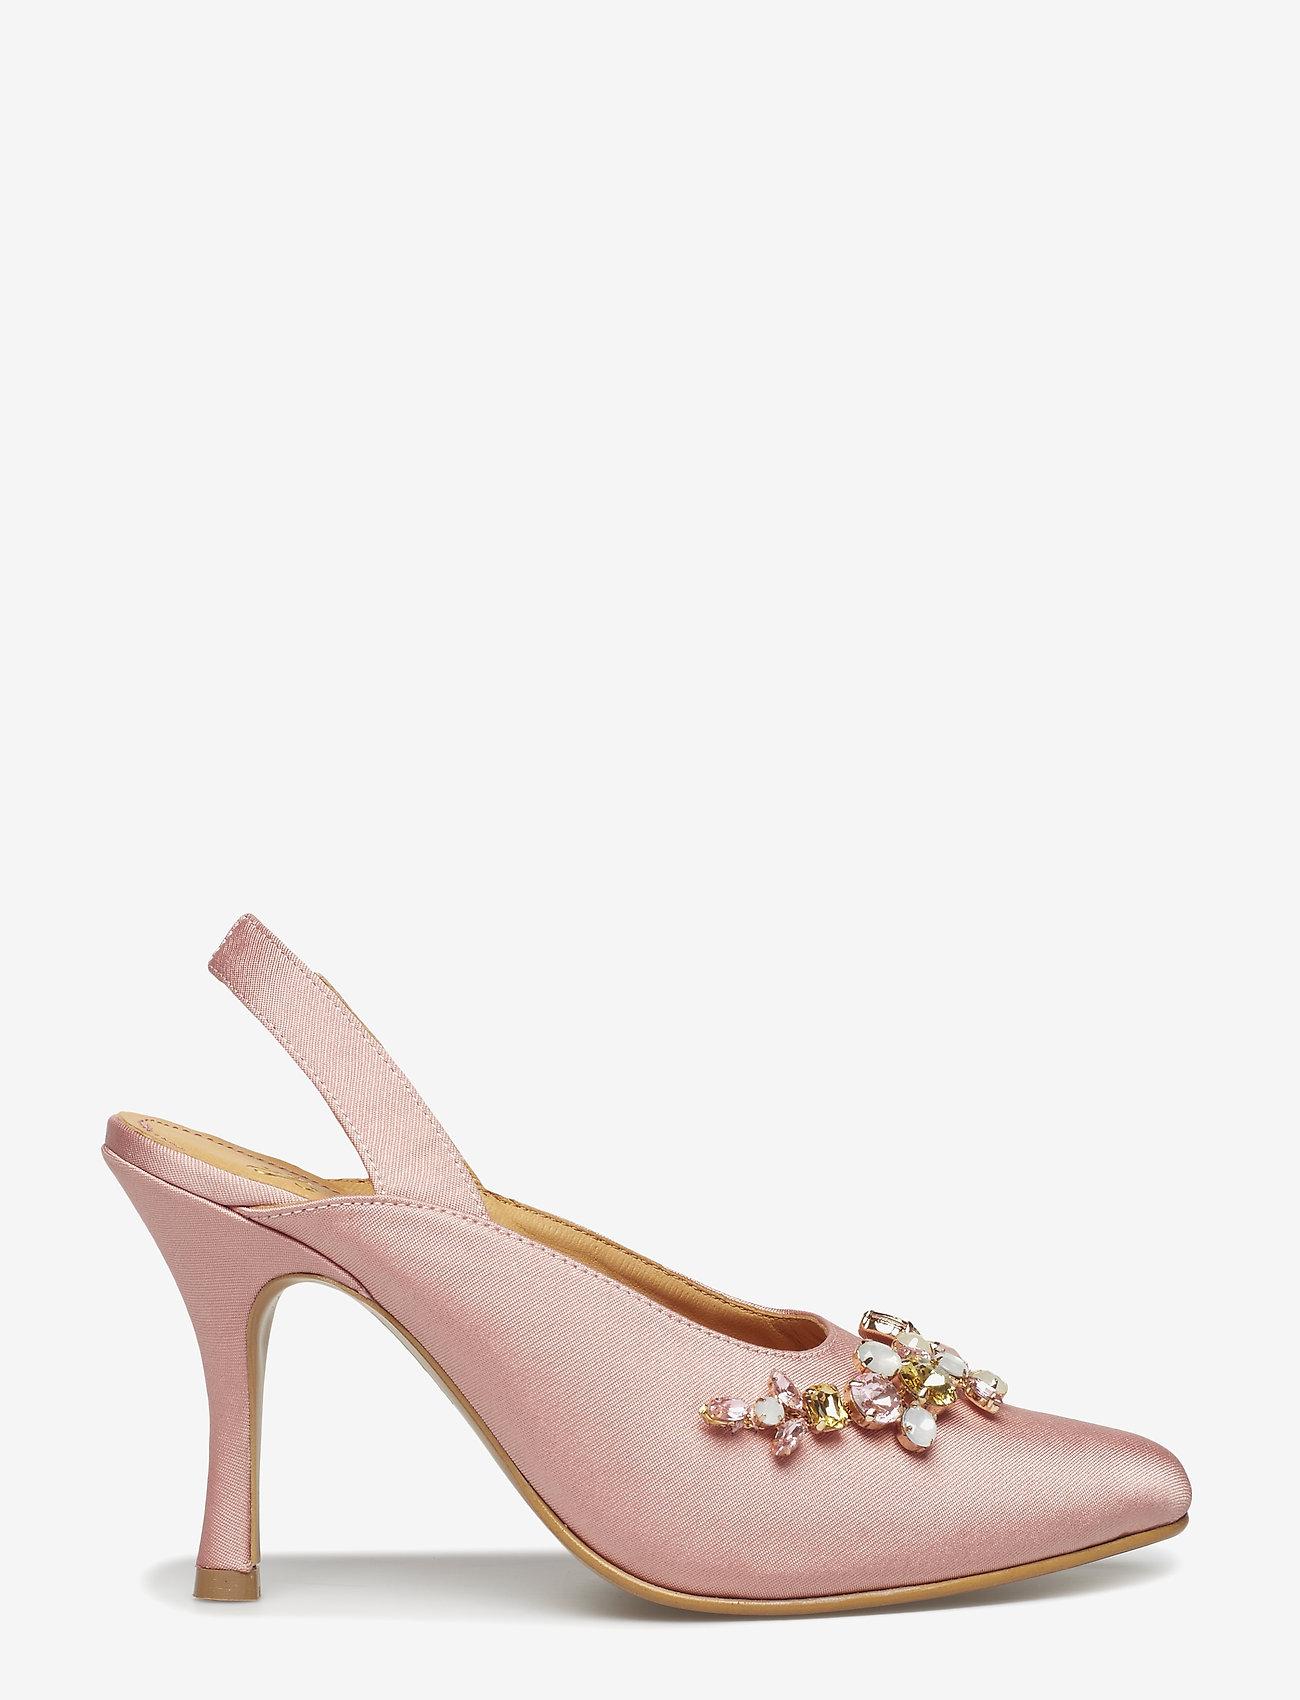 Lucia, 460 Satin Pumps (Pink) - STINE GOYA